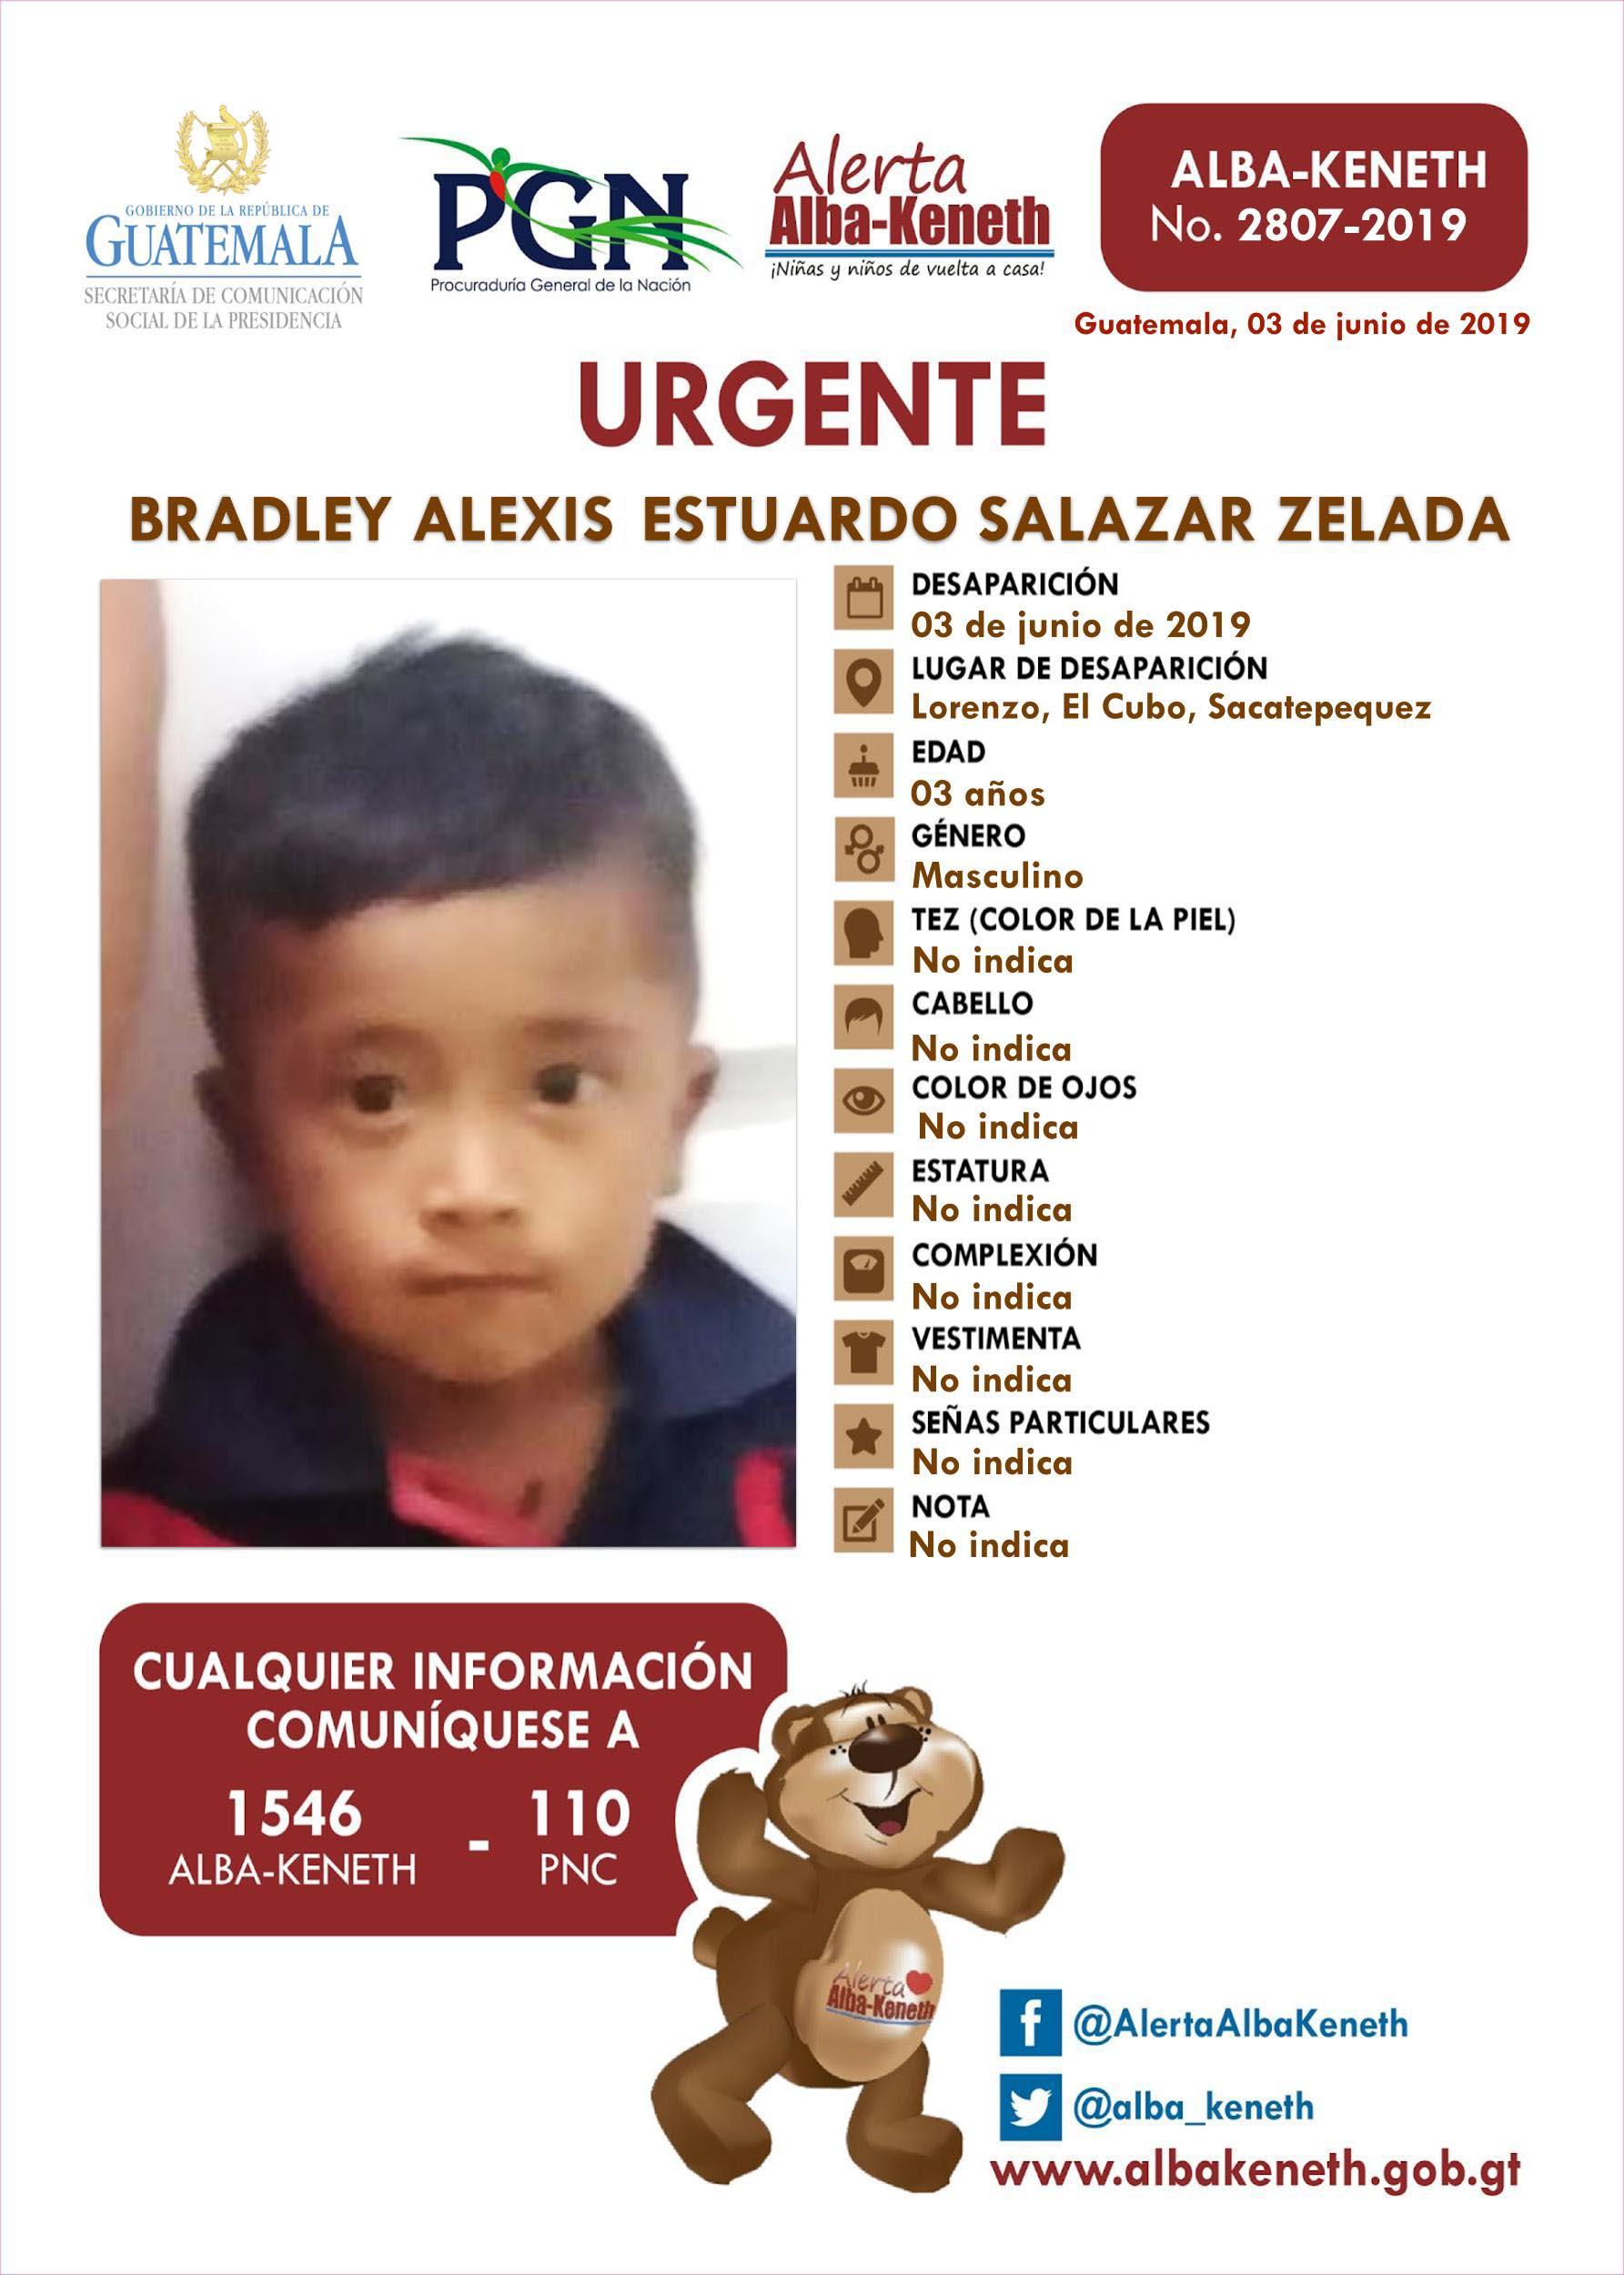 Bradley Alexis Estuardo Salazar Zelada